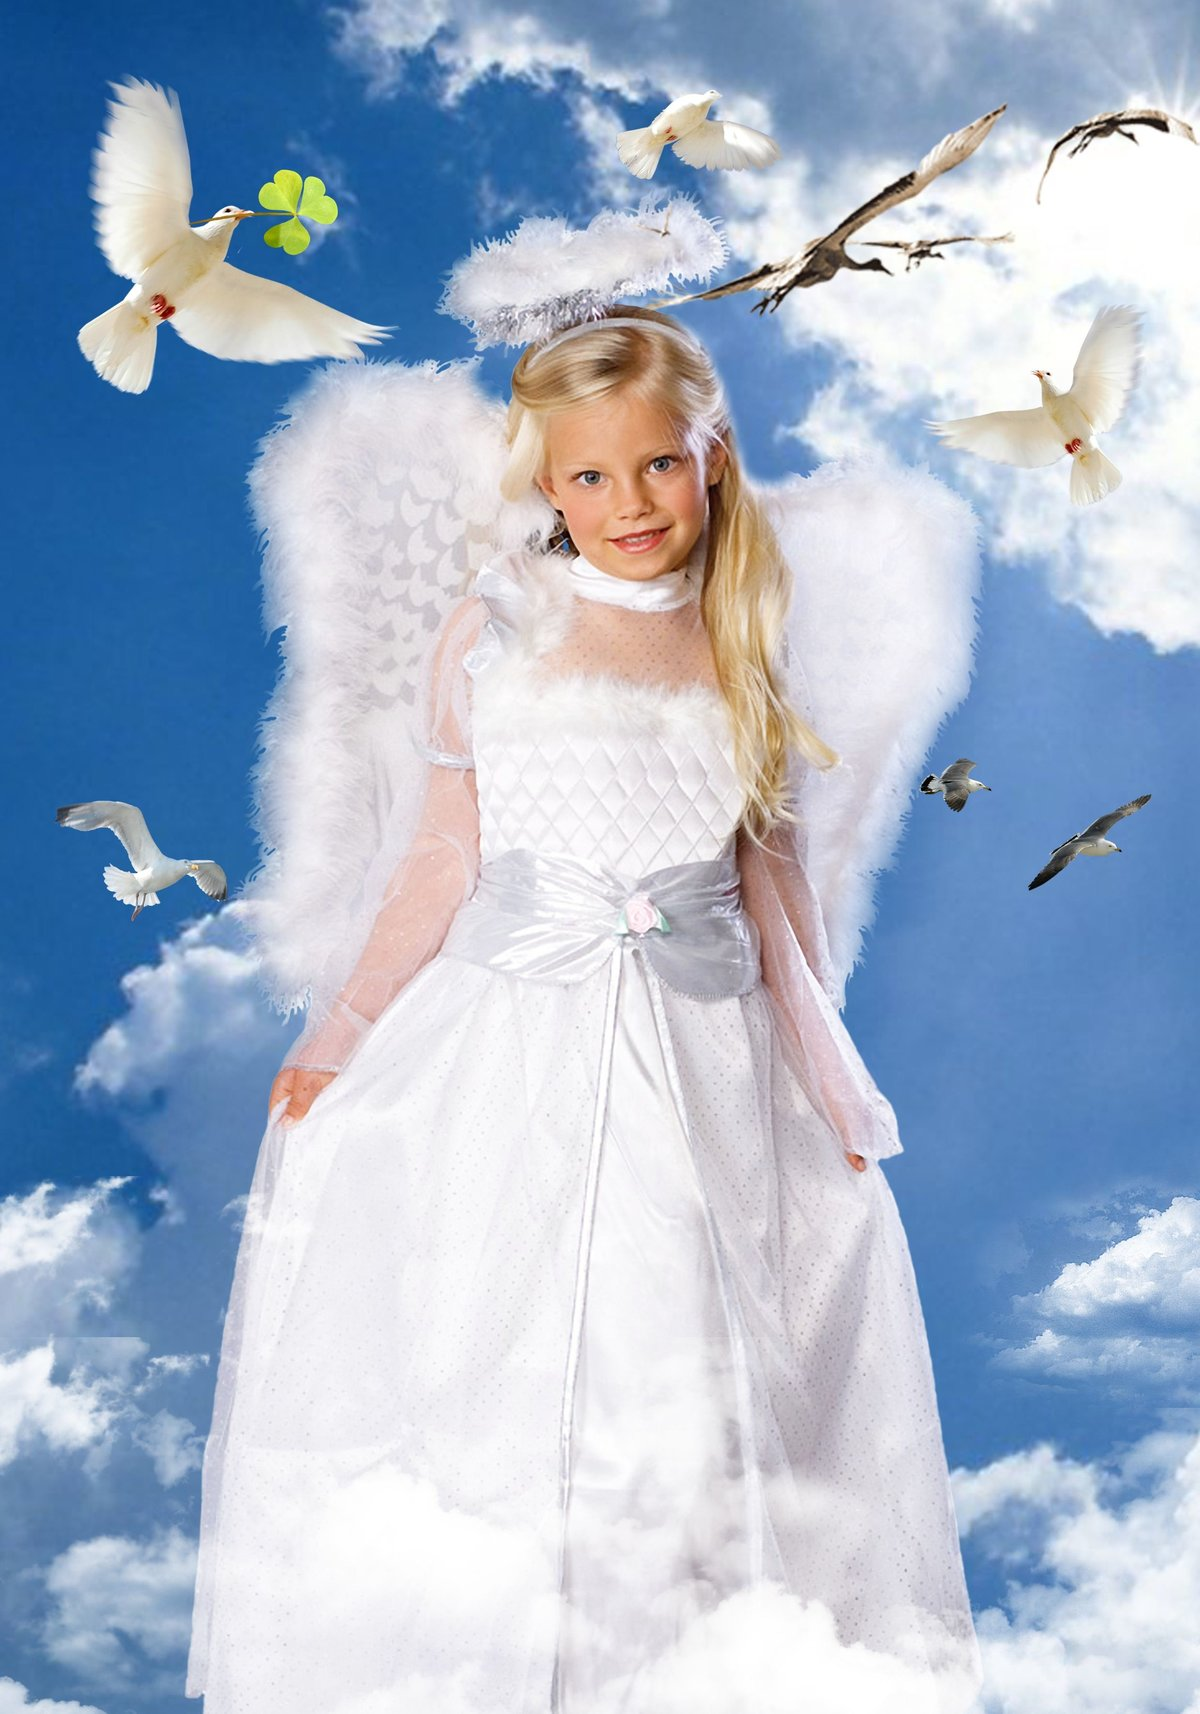 Днем, ангелы картинки фотошоп